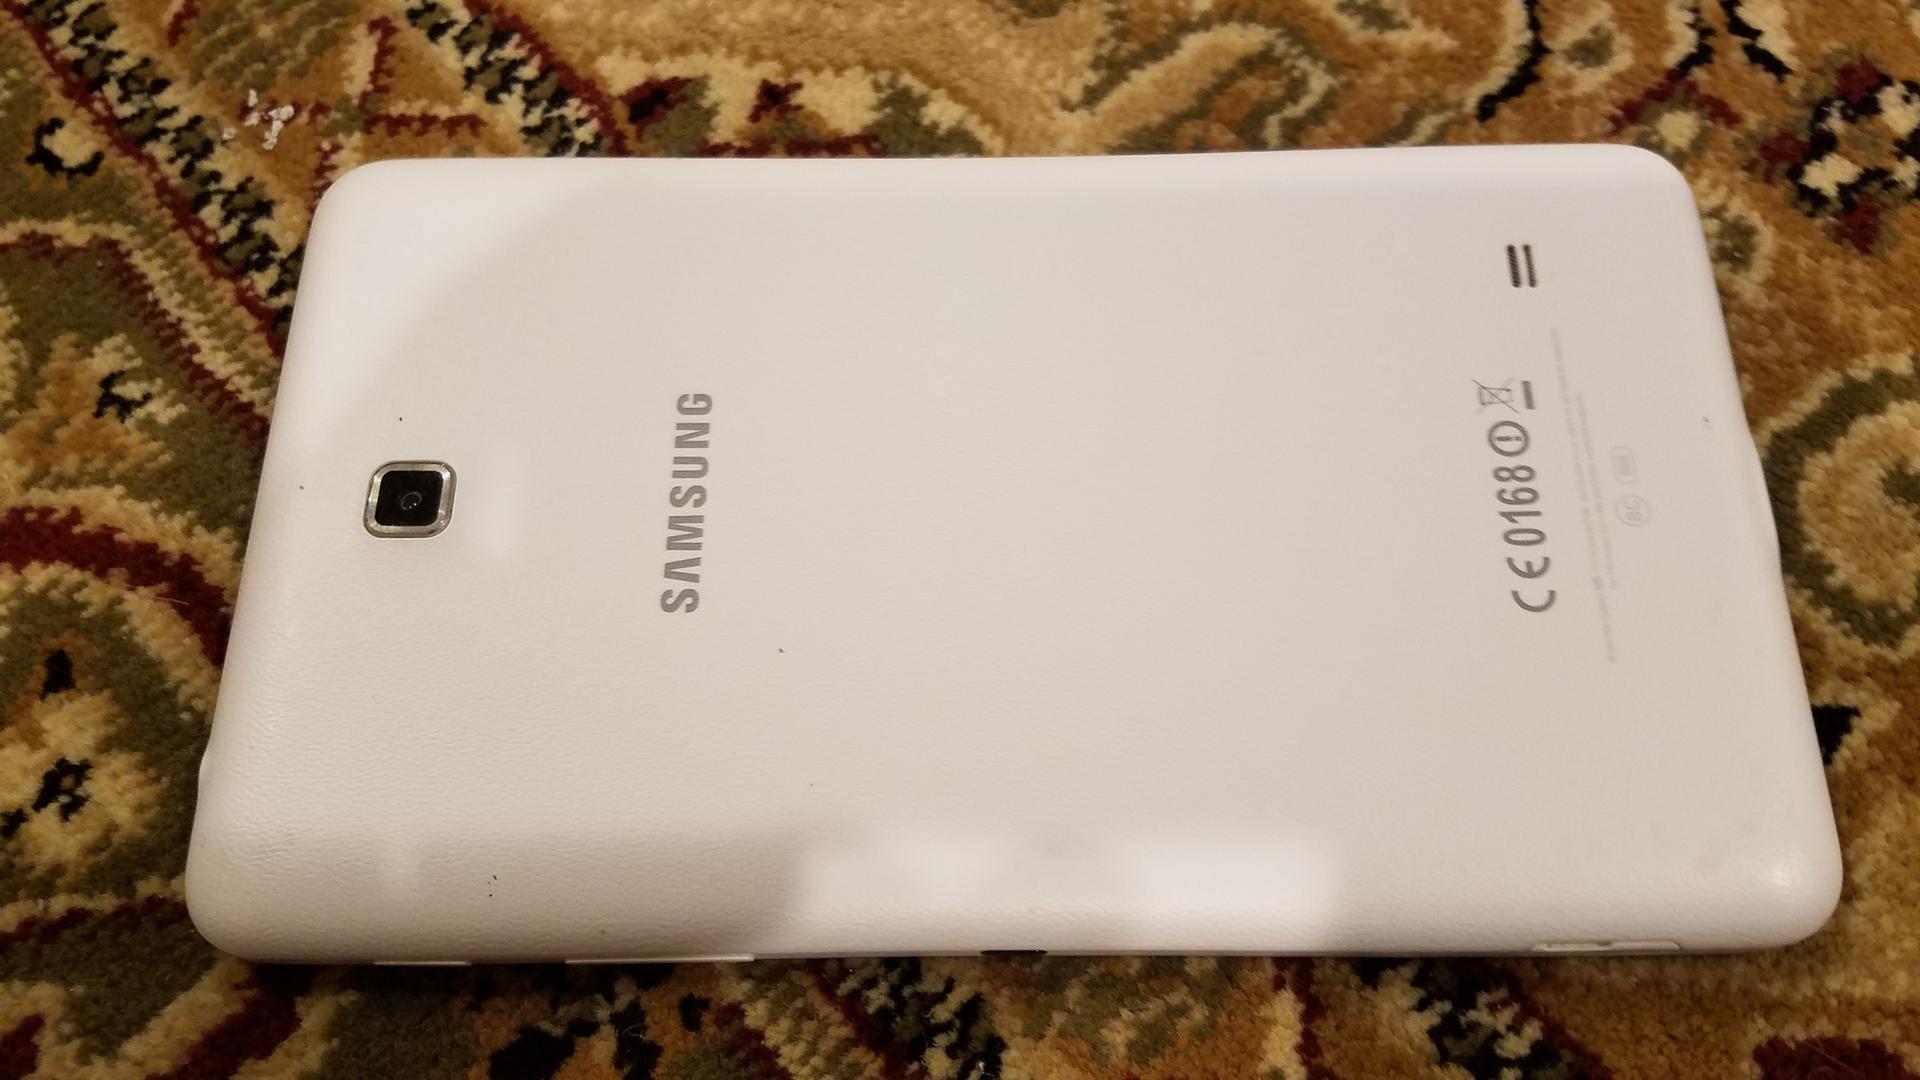 Samsung Galaxy Tab 4 (Wi-Fi) [SM-T230], 7 - White, 8 GB